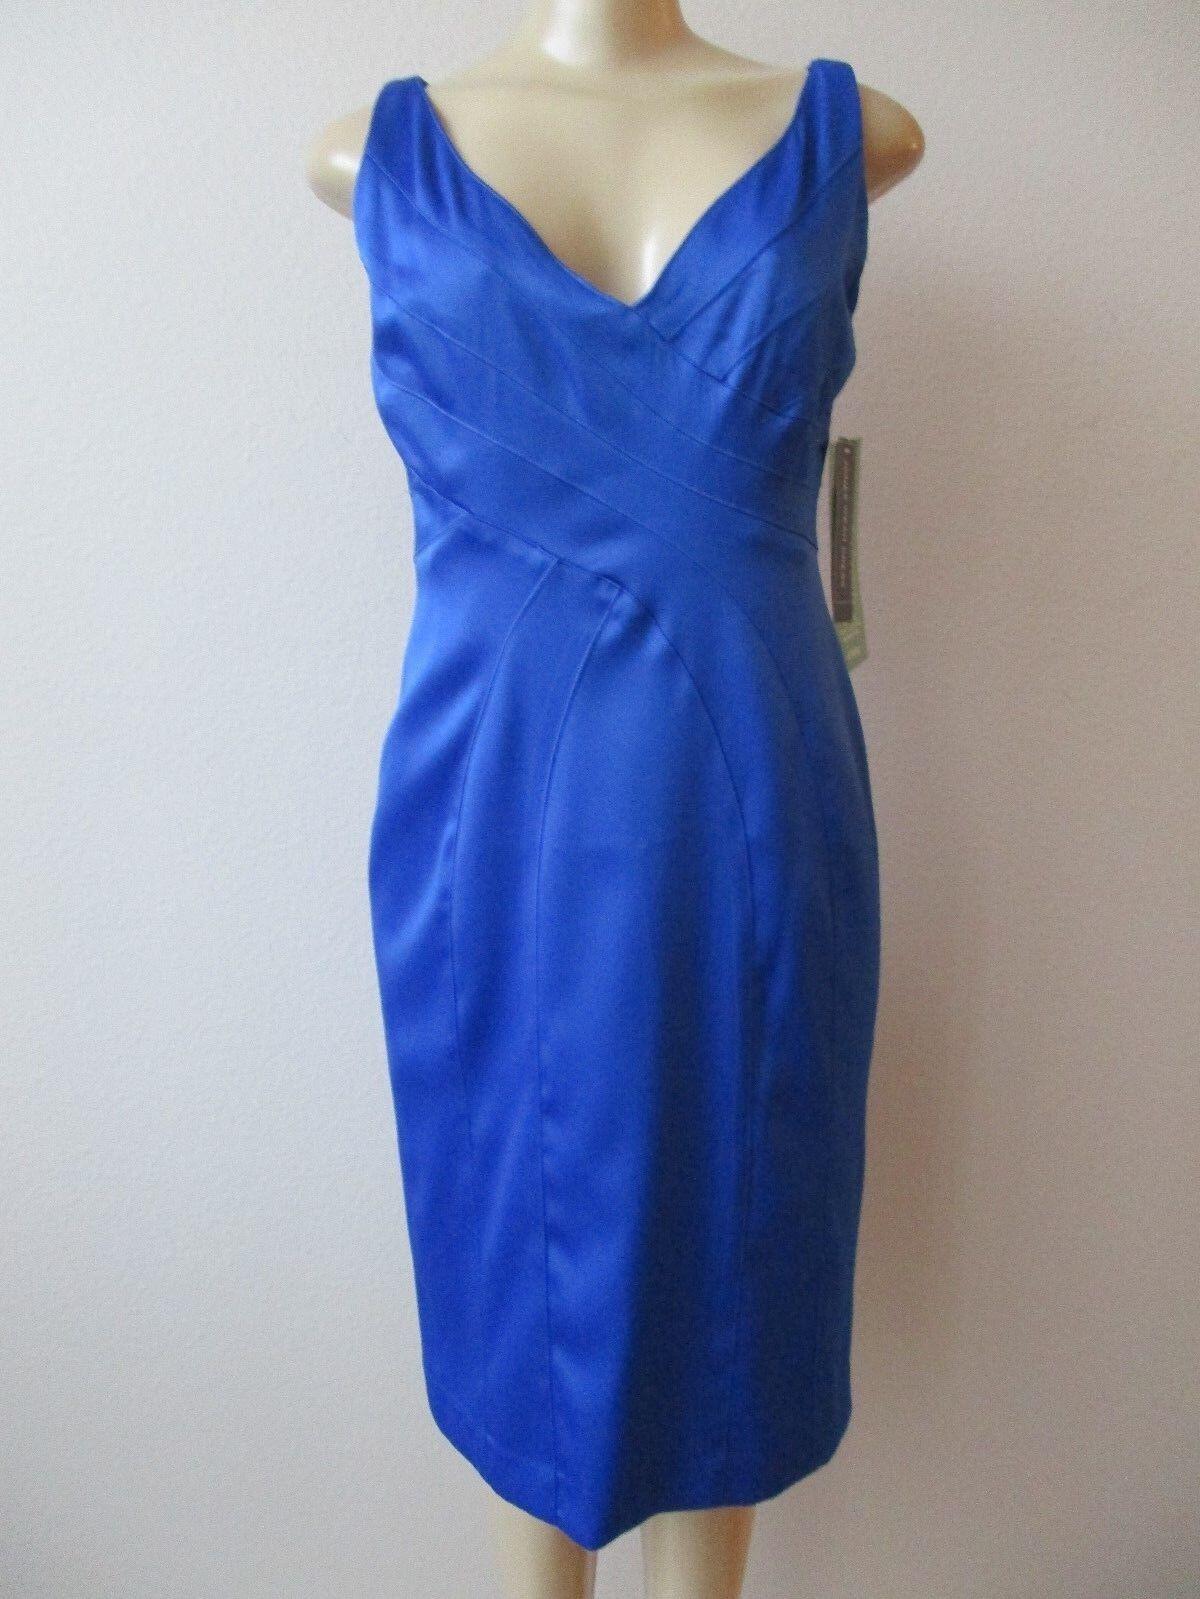 JONES WEAR ROYAL blueE SLEEVELESS DRESS SIZE 8 - NWT